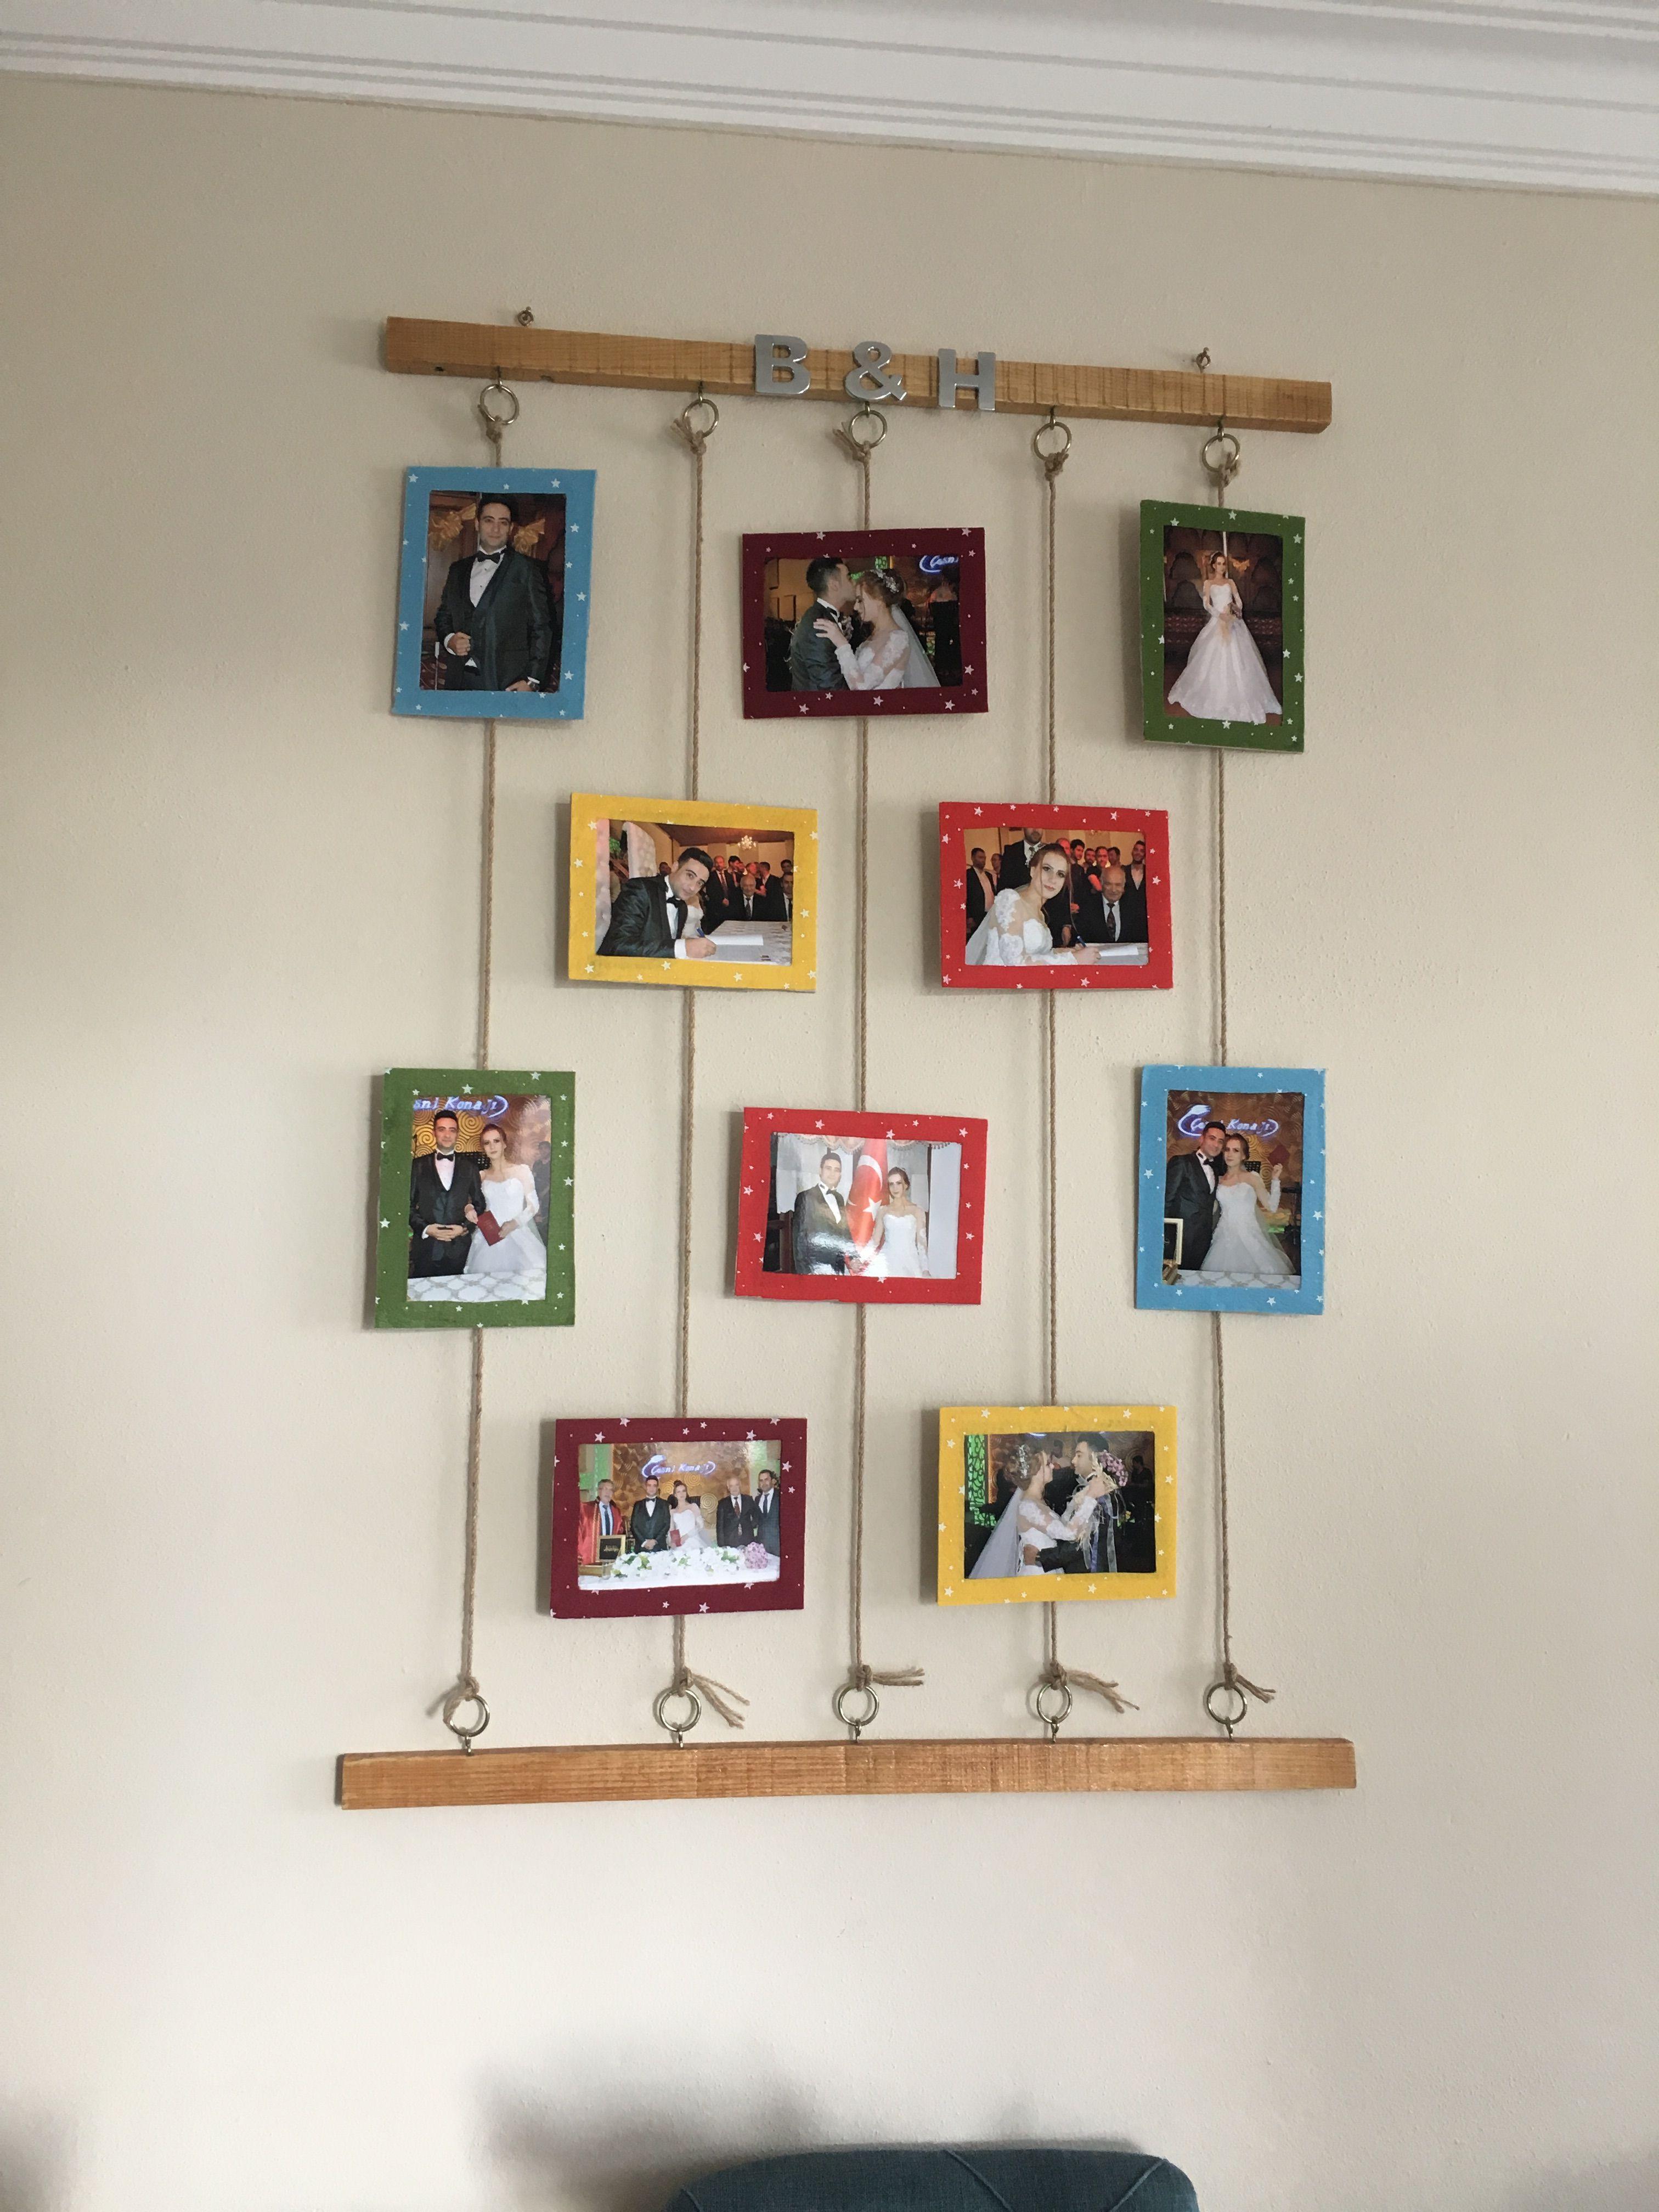 Pin By Sapna Gupta On New House Ideas Frame Wall Decor Diy Home Bedroom Frames